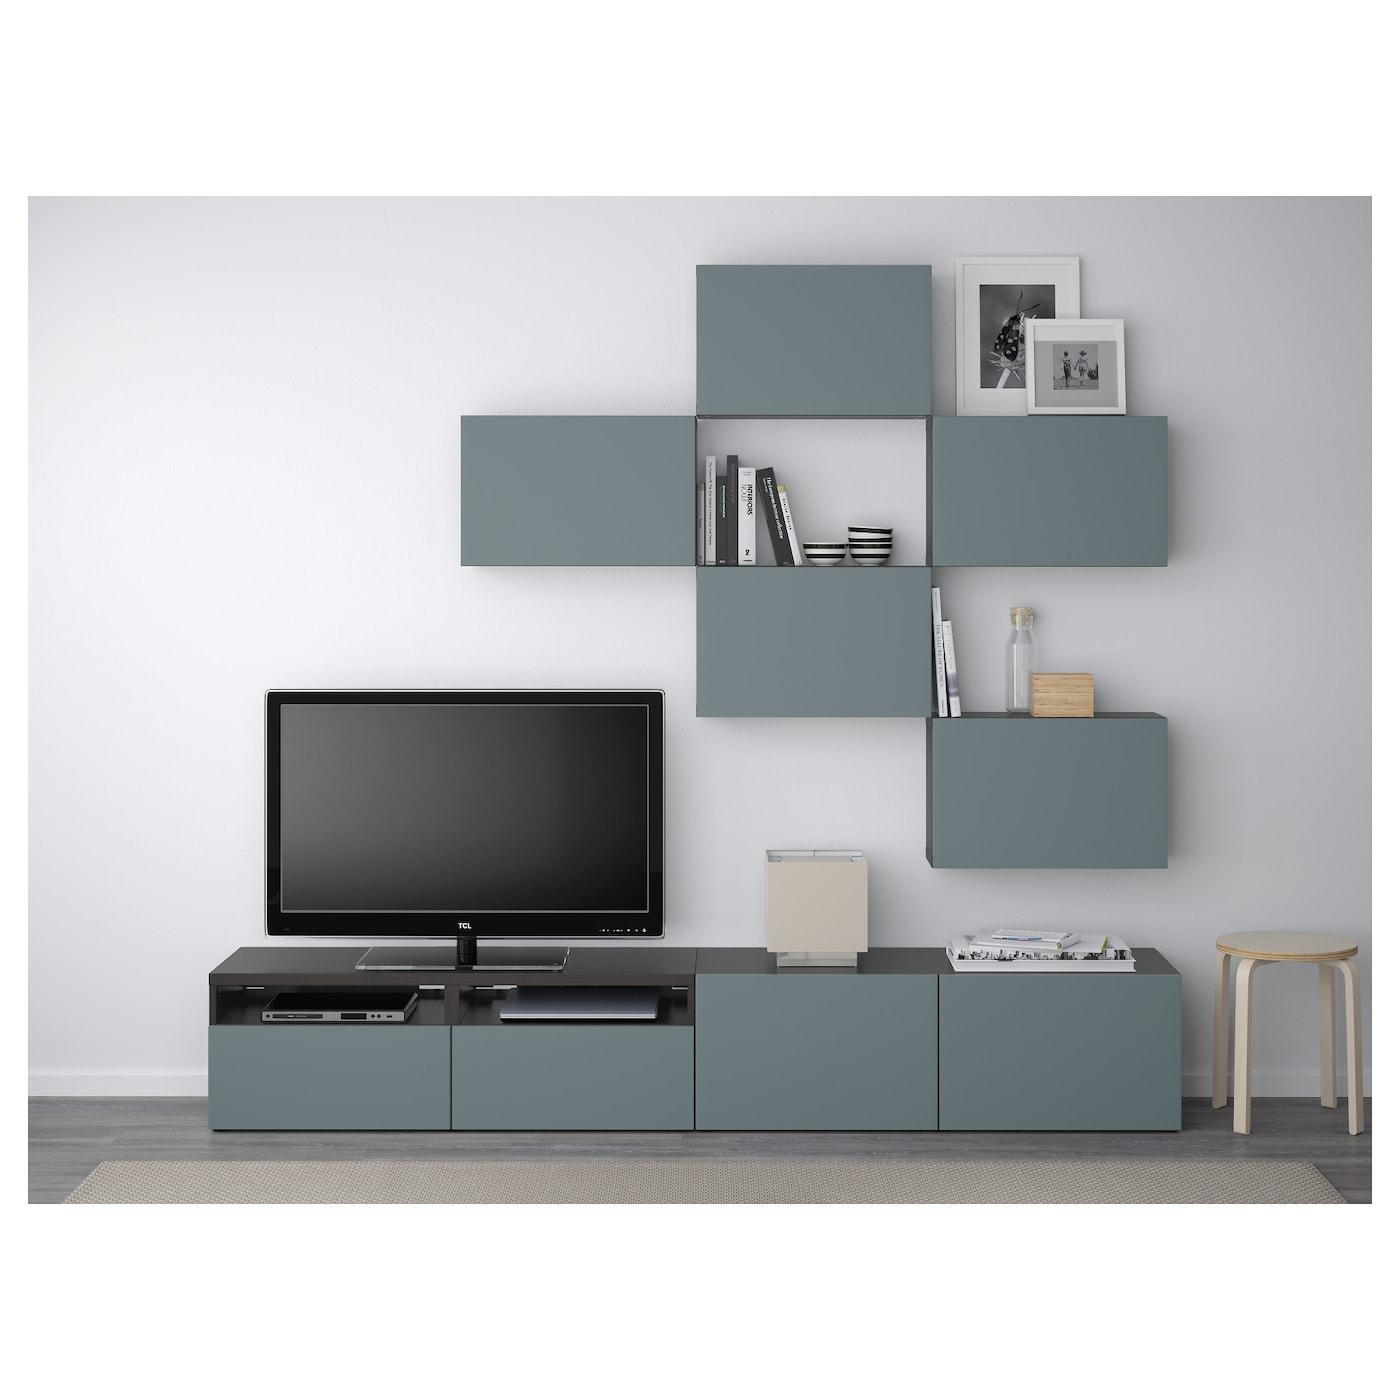 Best Combinaison Meuble Tv Brun Noir Valviken Gris Turquoise  # Meuble Tv Noir Et Gris